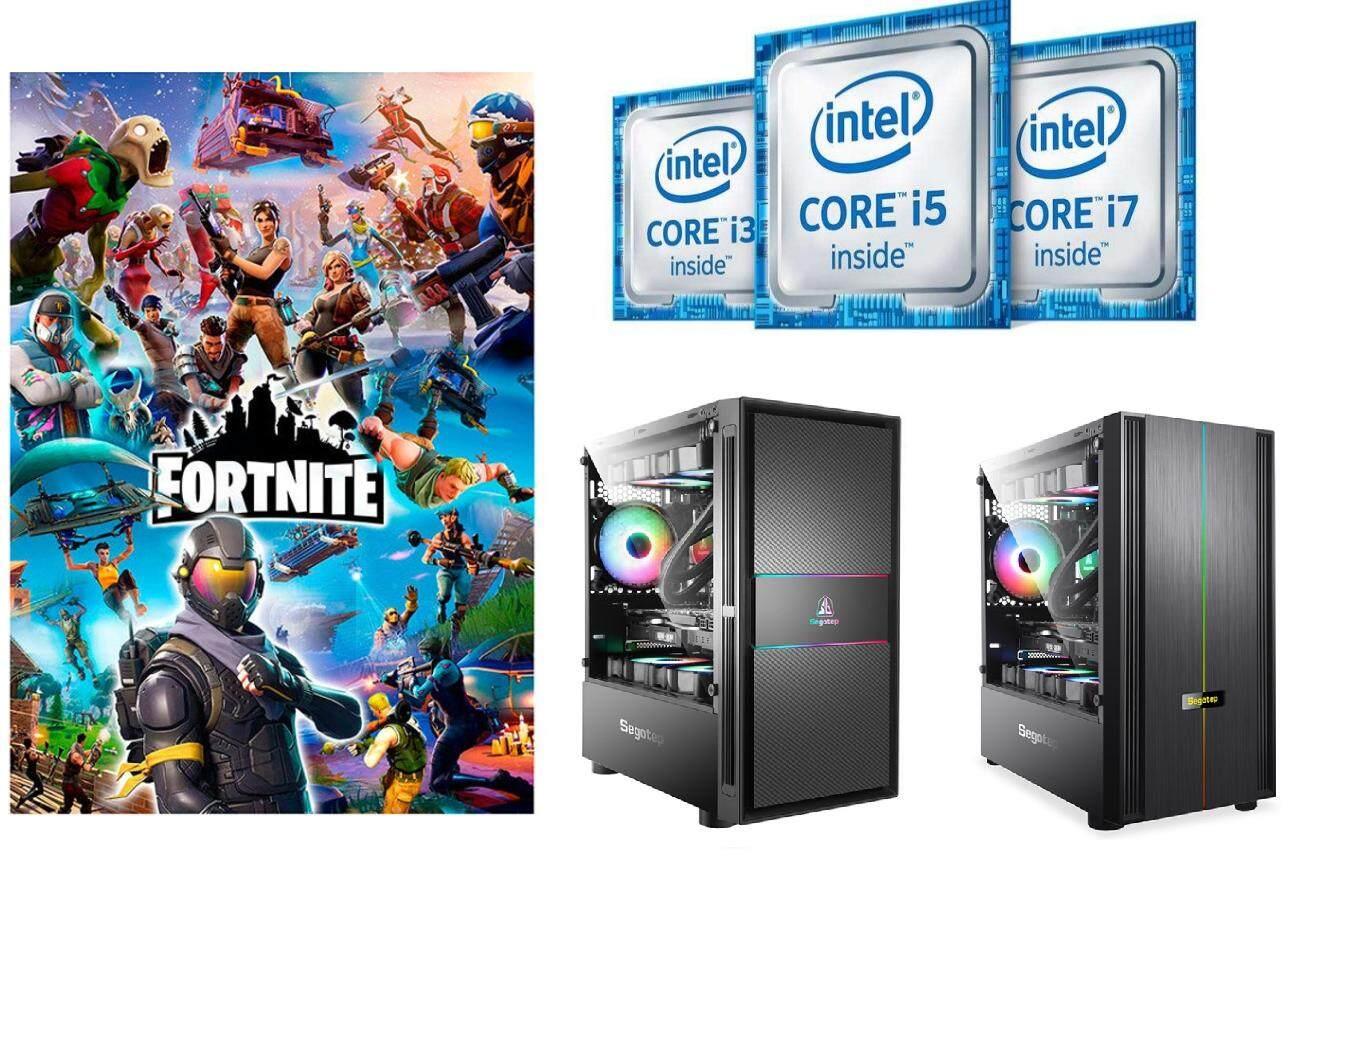 Intel Core i7 Core i5 Core i3 Nvidia GTX1050 GTX1060 GTX1650 RTX2060 16GB  8GB RAM 480GB 240GB 120GB SSD gaming desktop pc for dota 2 csgo PUBG